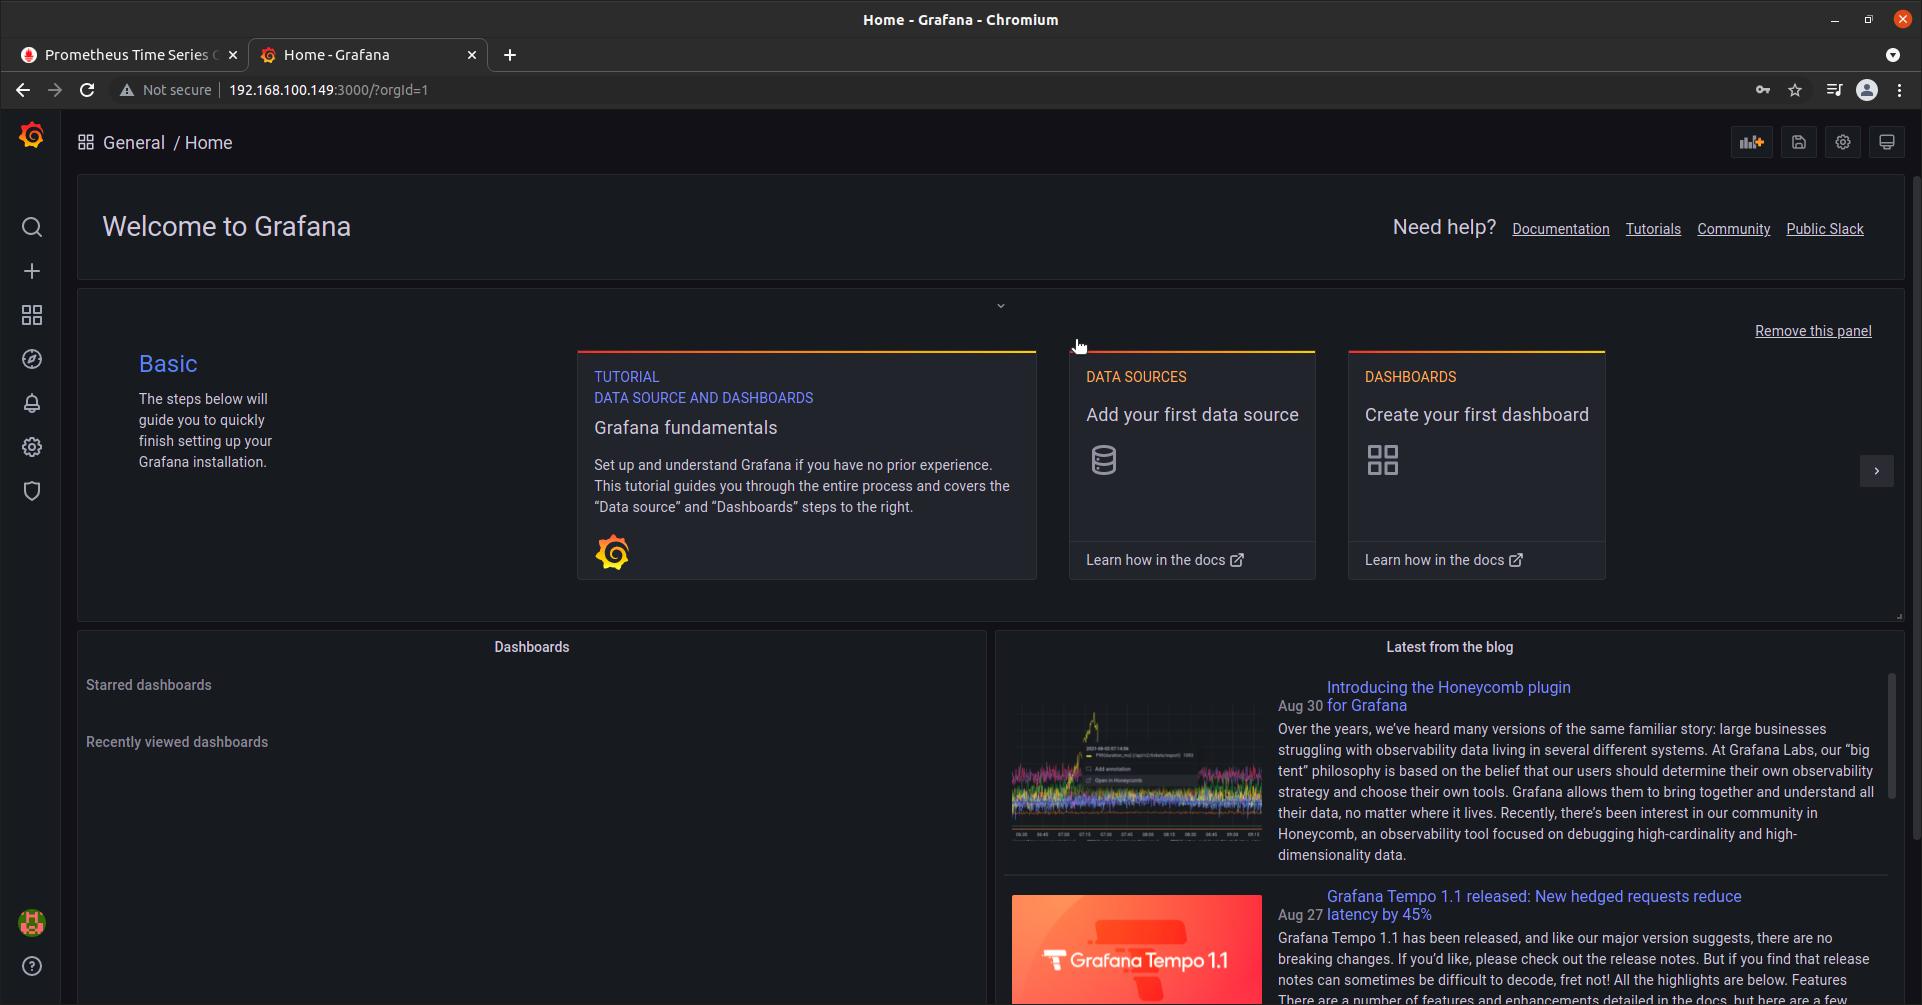 Setup Grafana with Prometheus Rocky Linux 8 [Step-by-Step]